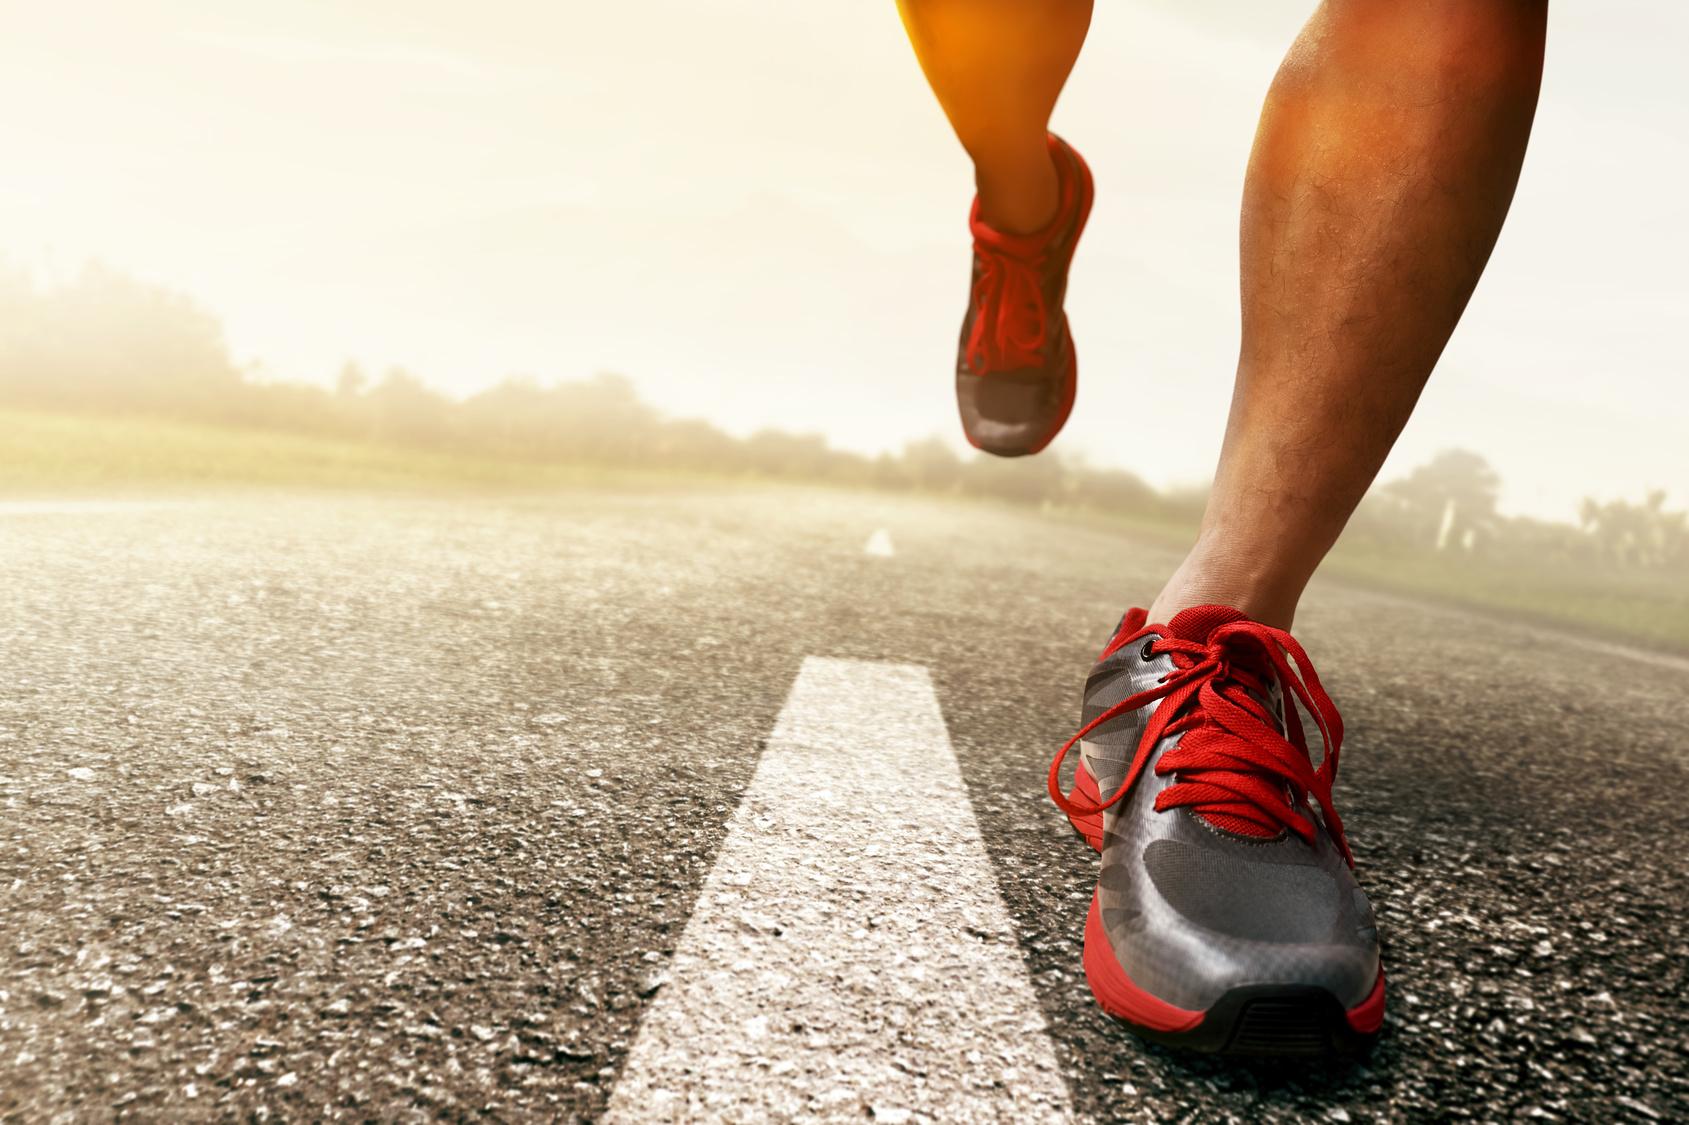 Running as You Get Older